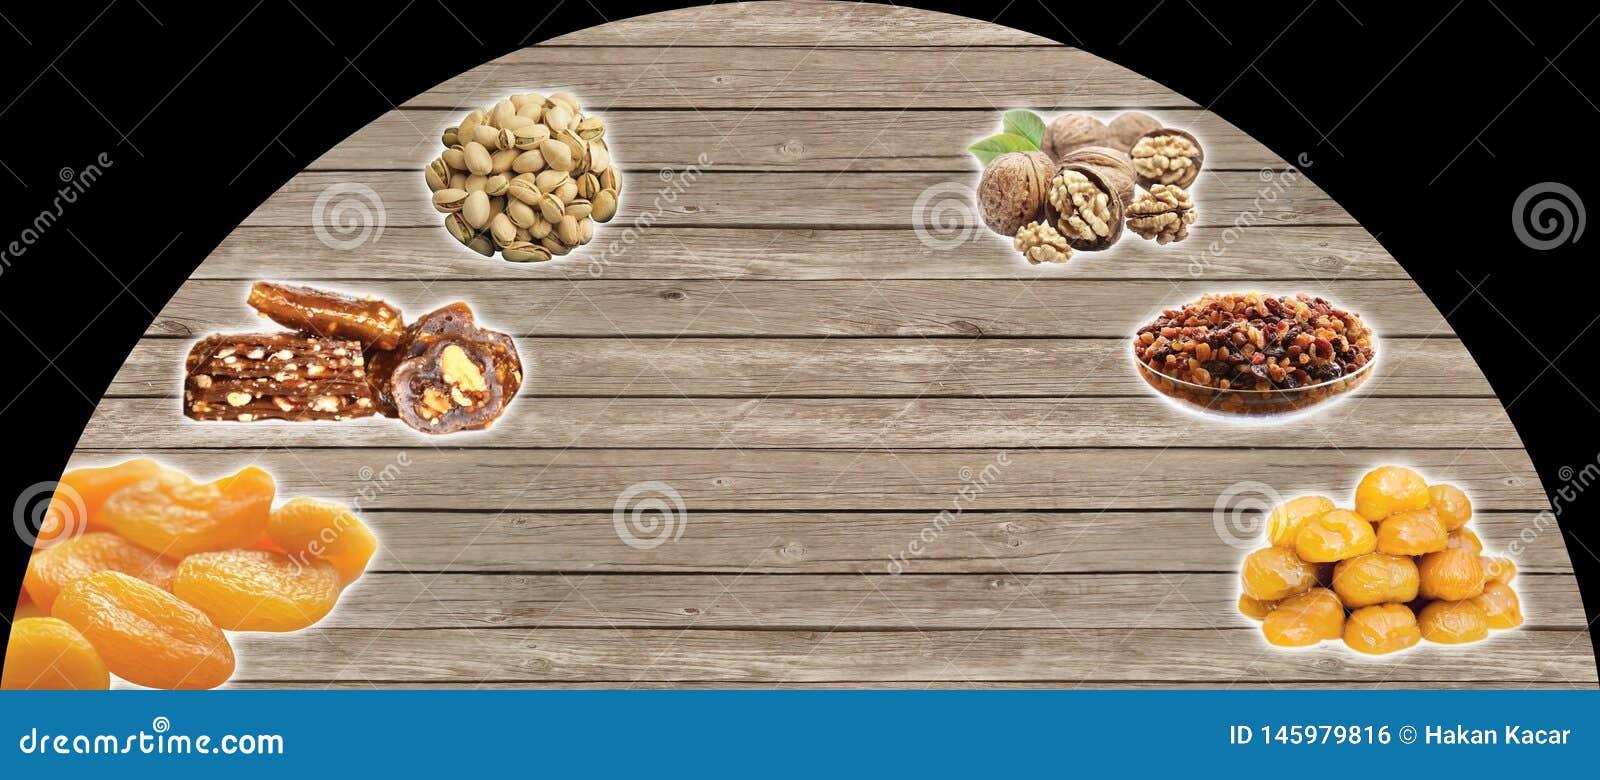 De Turkse noten, Turks spreken: kuruyemis